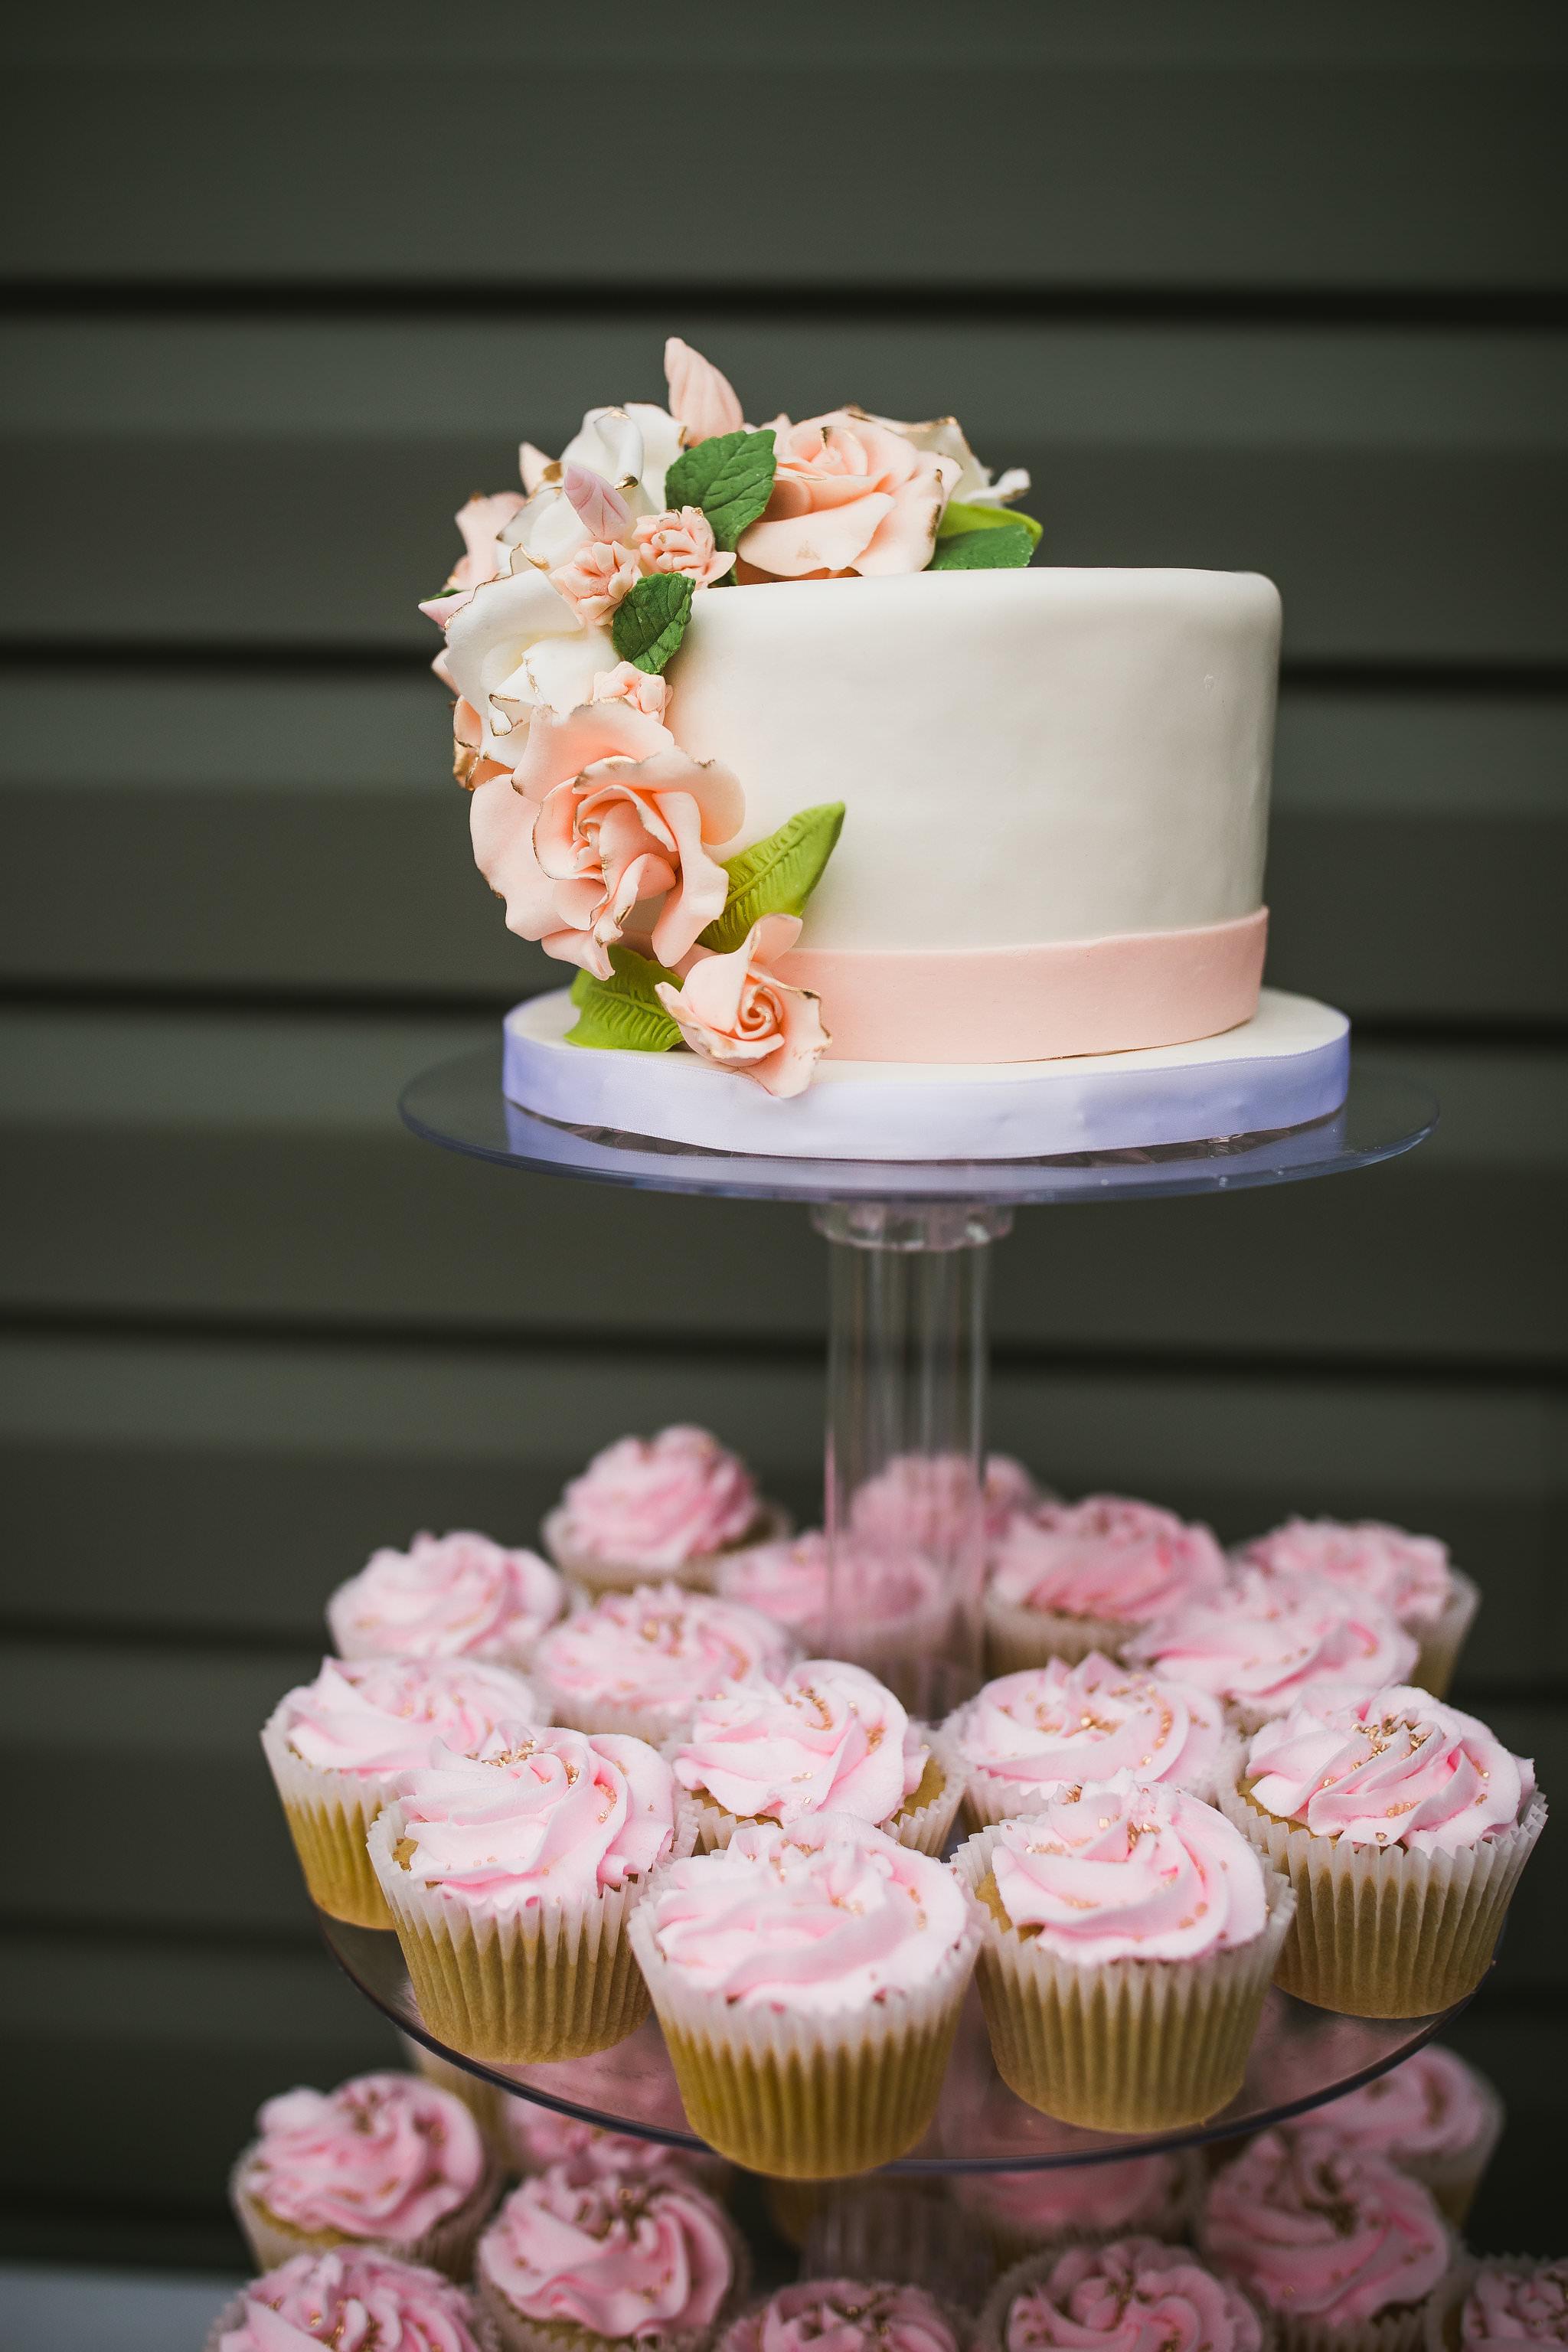 Kristen Adam Kindred Loft Whitby Wedding Photos 92 - Durham Wedding Photographer: Kindred Loft Wedding Photos